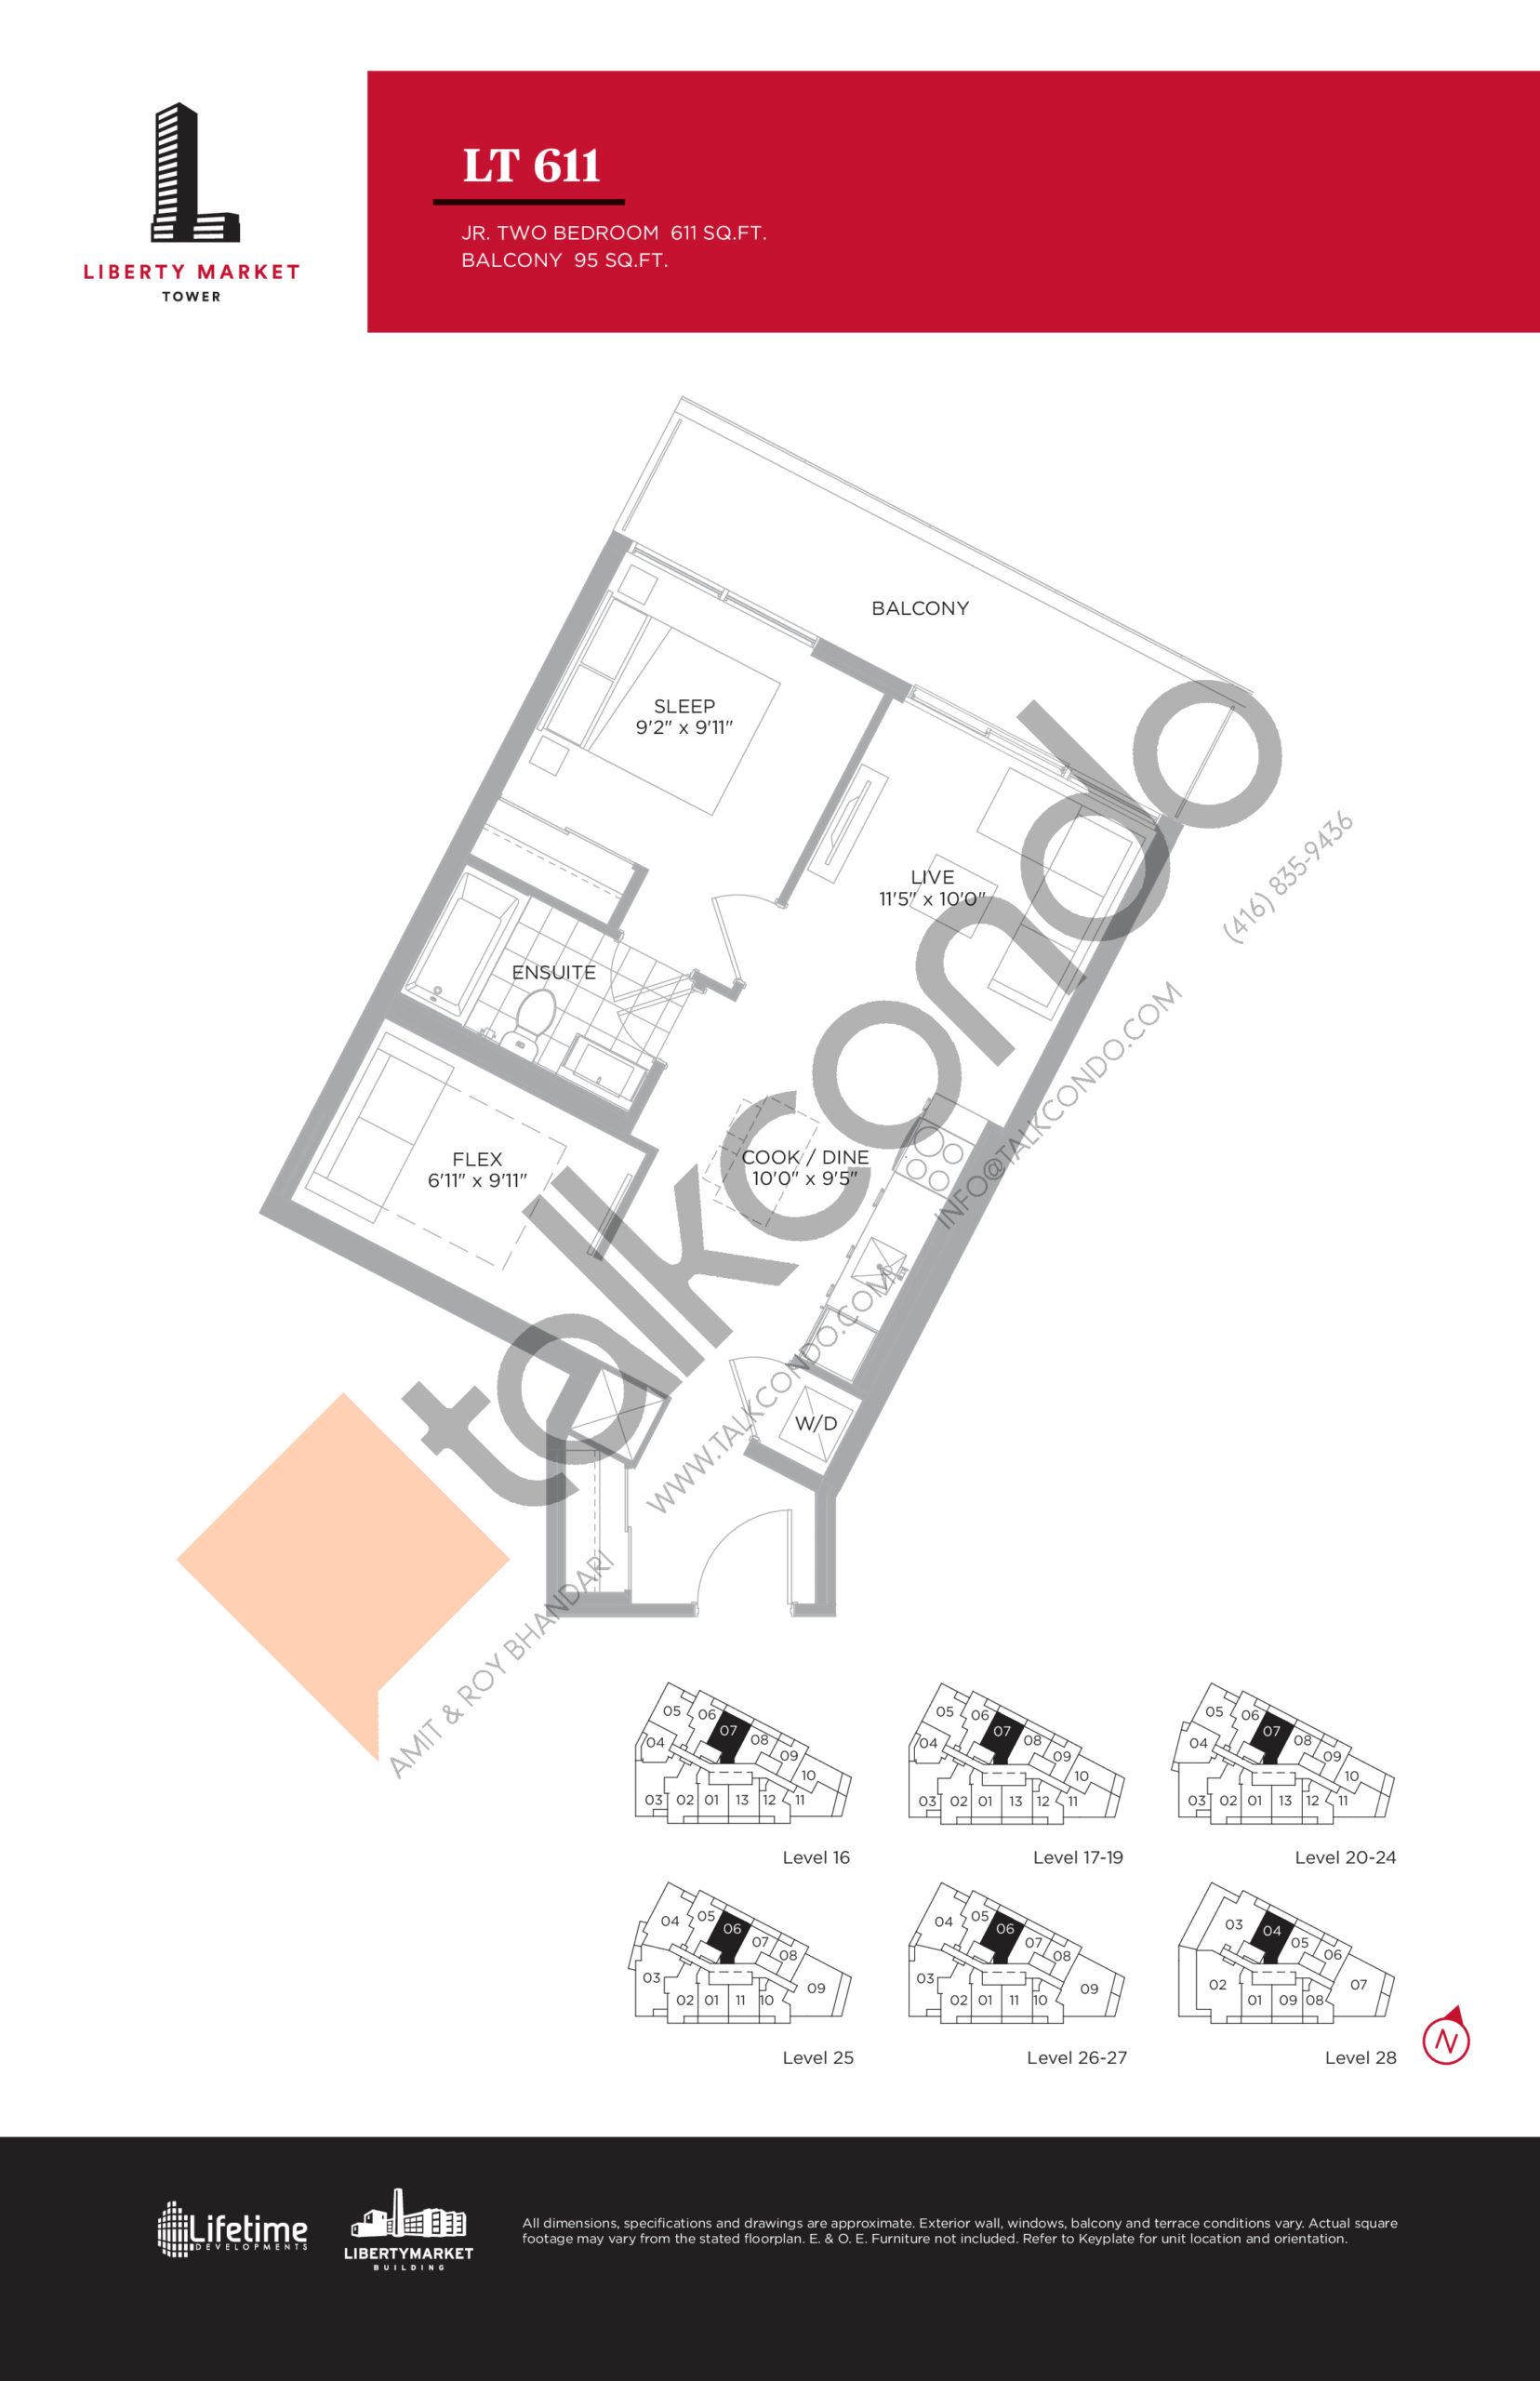 LT 611 Floor Plan at Liberty Market Tower Condos - 611 sq.ft